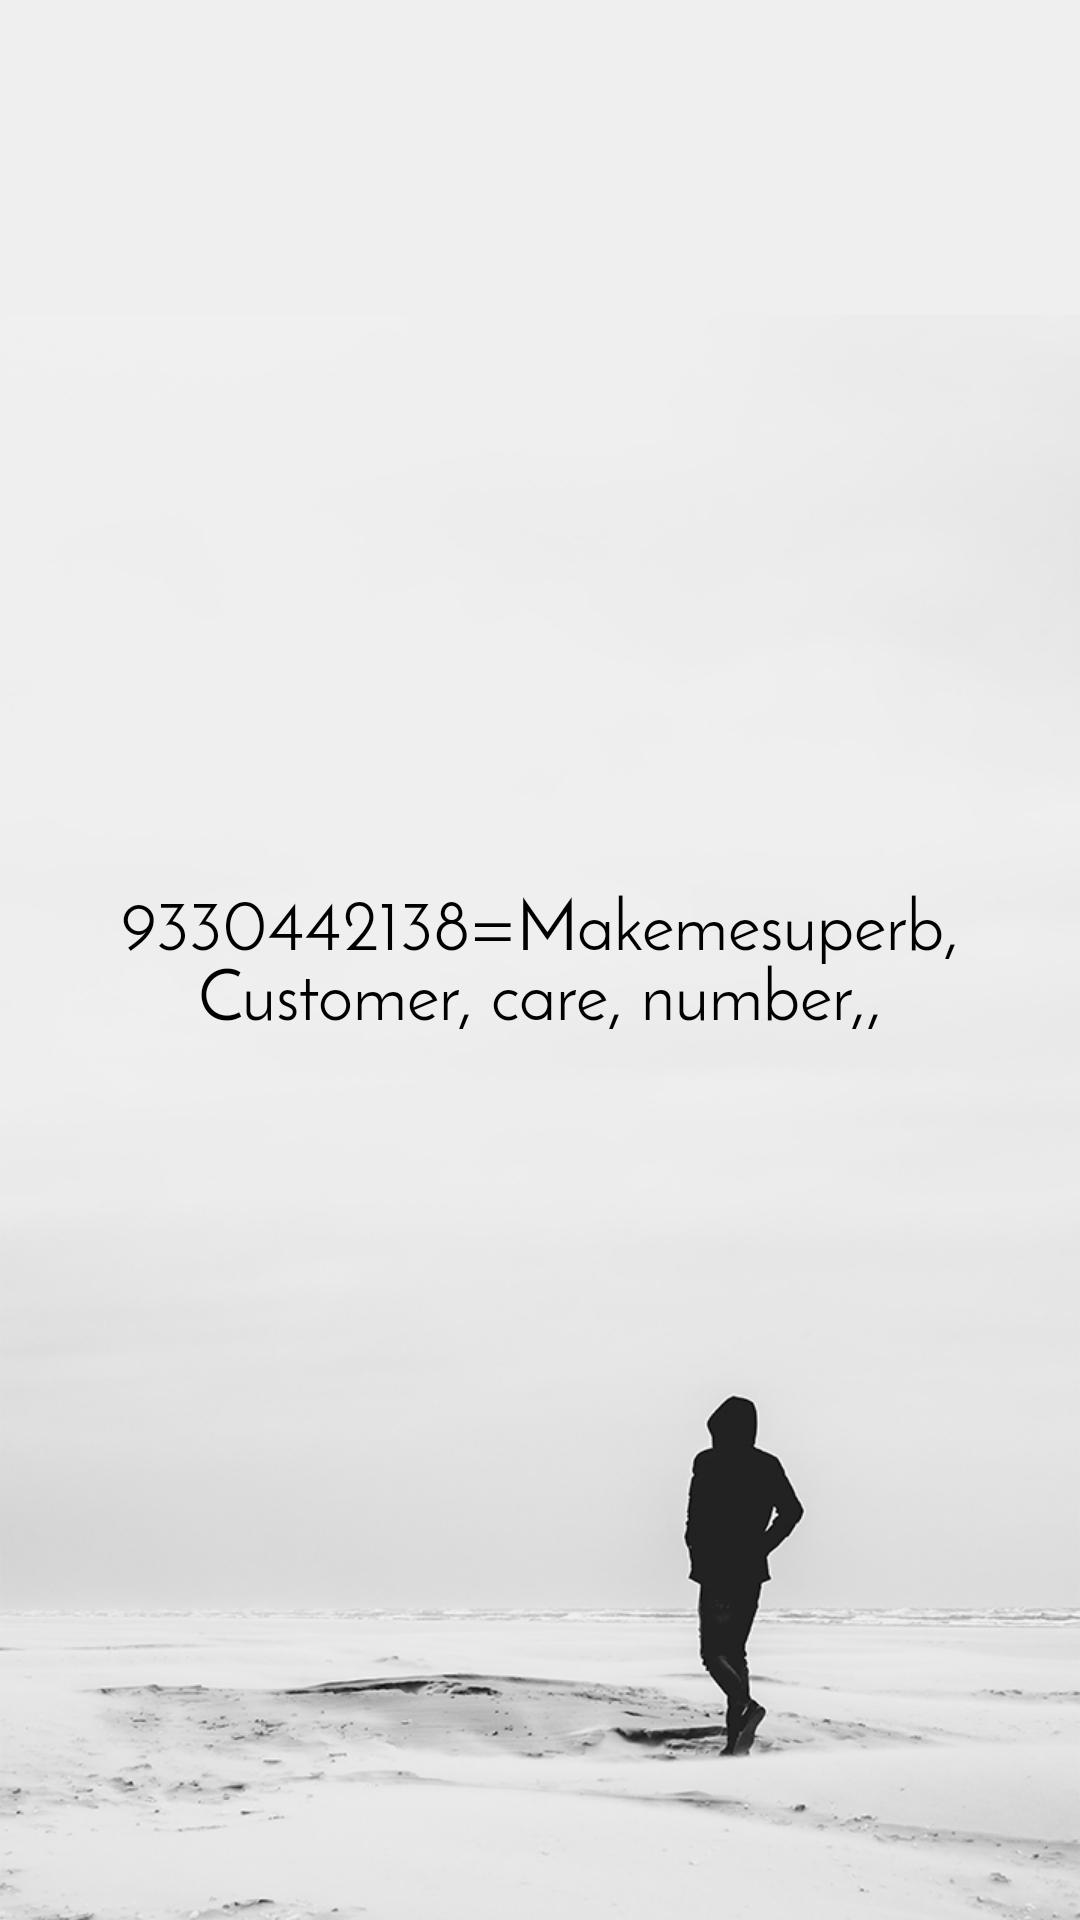 9330442138=Makemesuperb, Customer, care, number,,